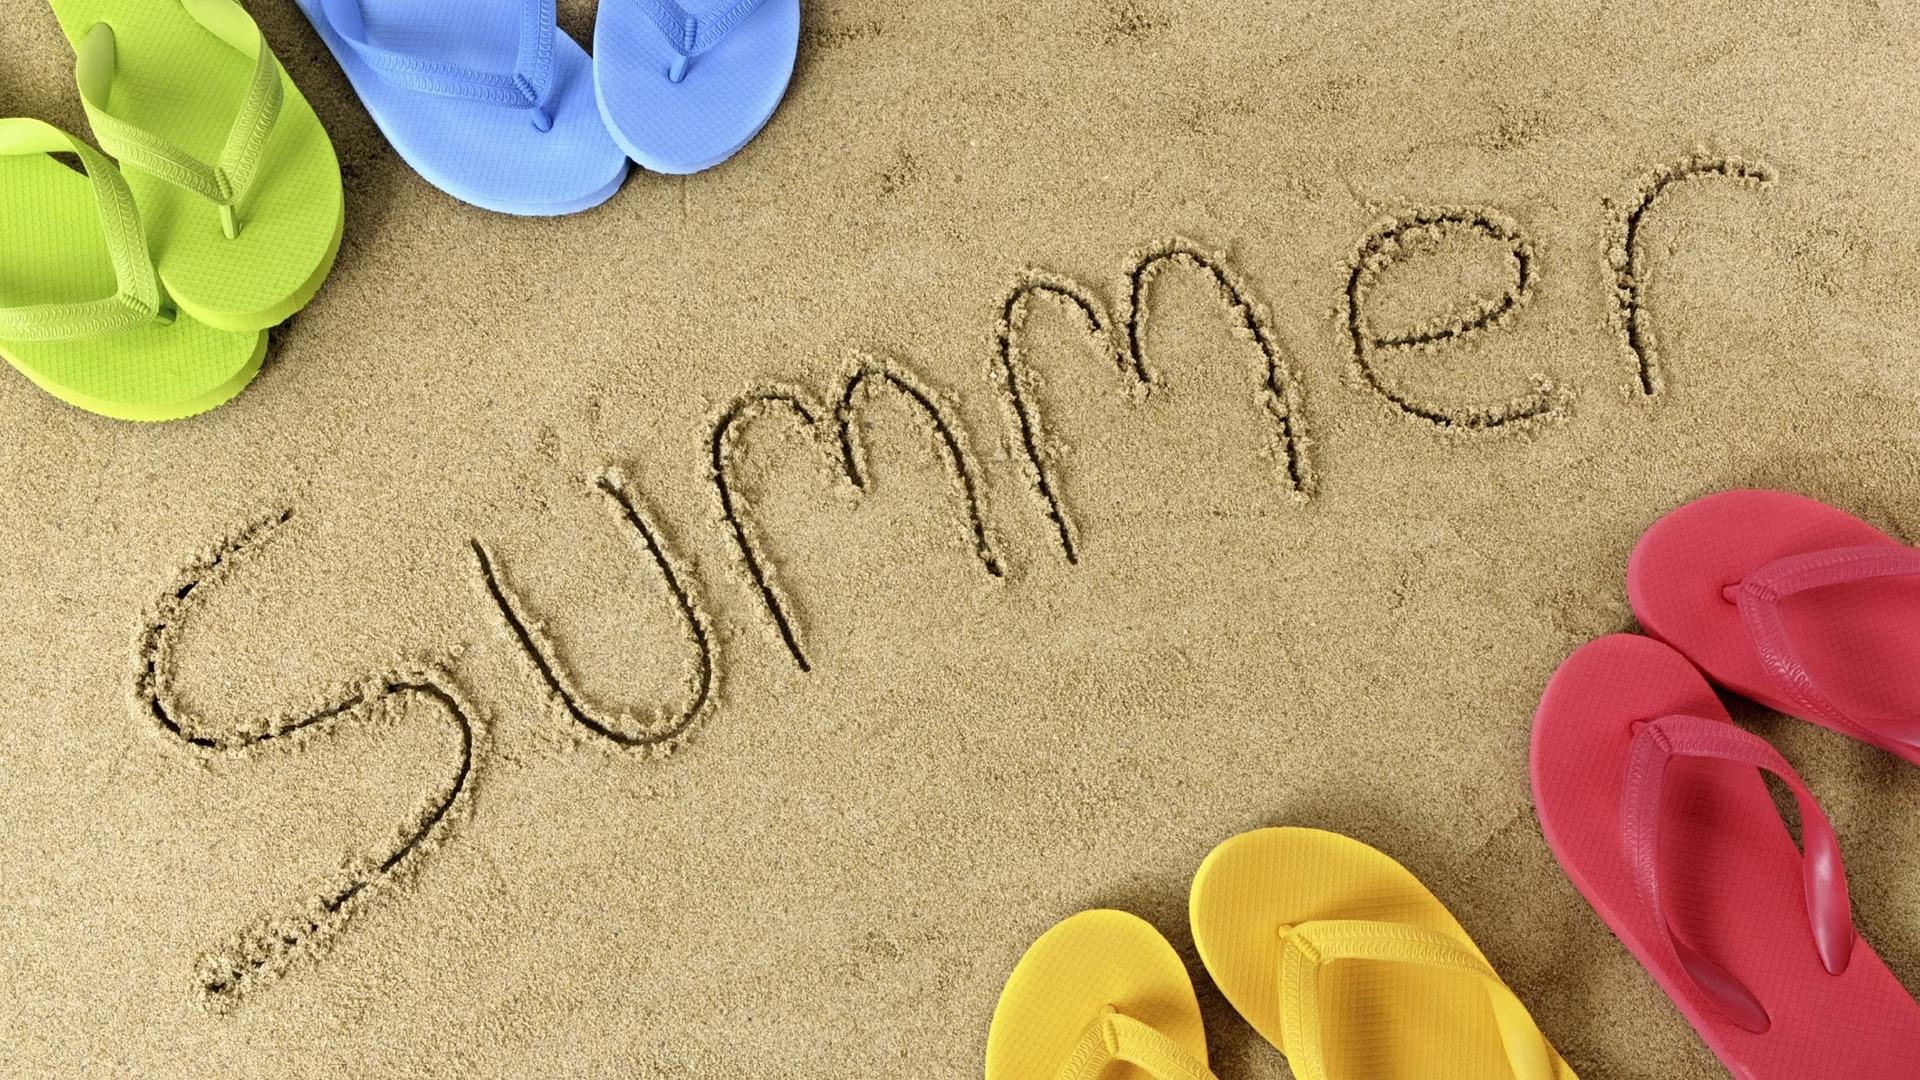 summer wallpaper for desktop, desktop wallpaper summer